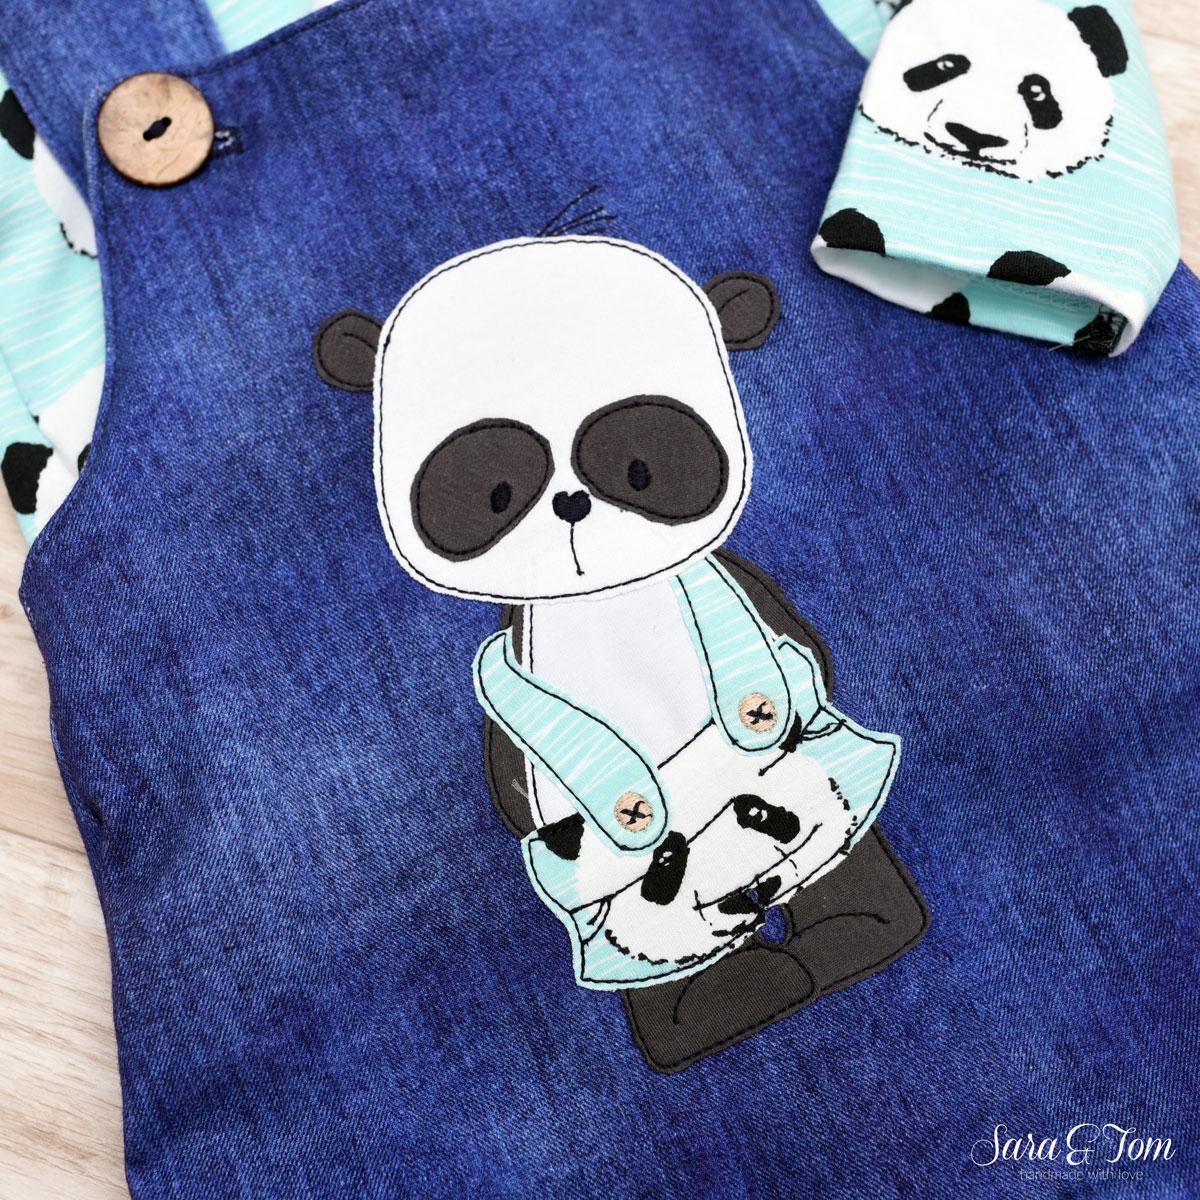 Pandaset sticken